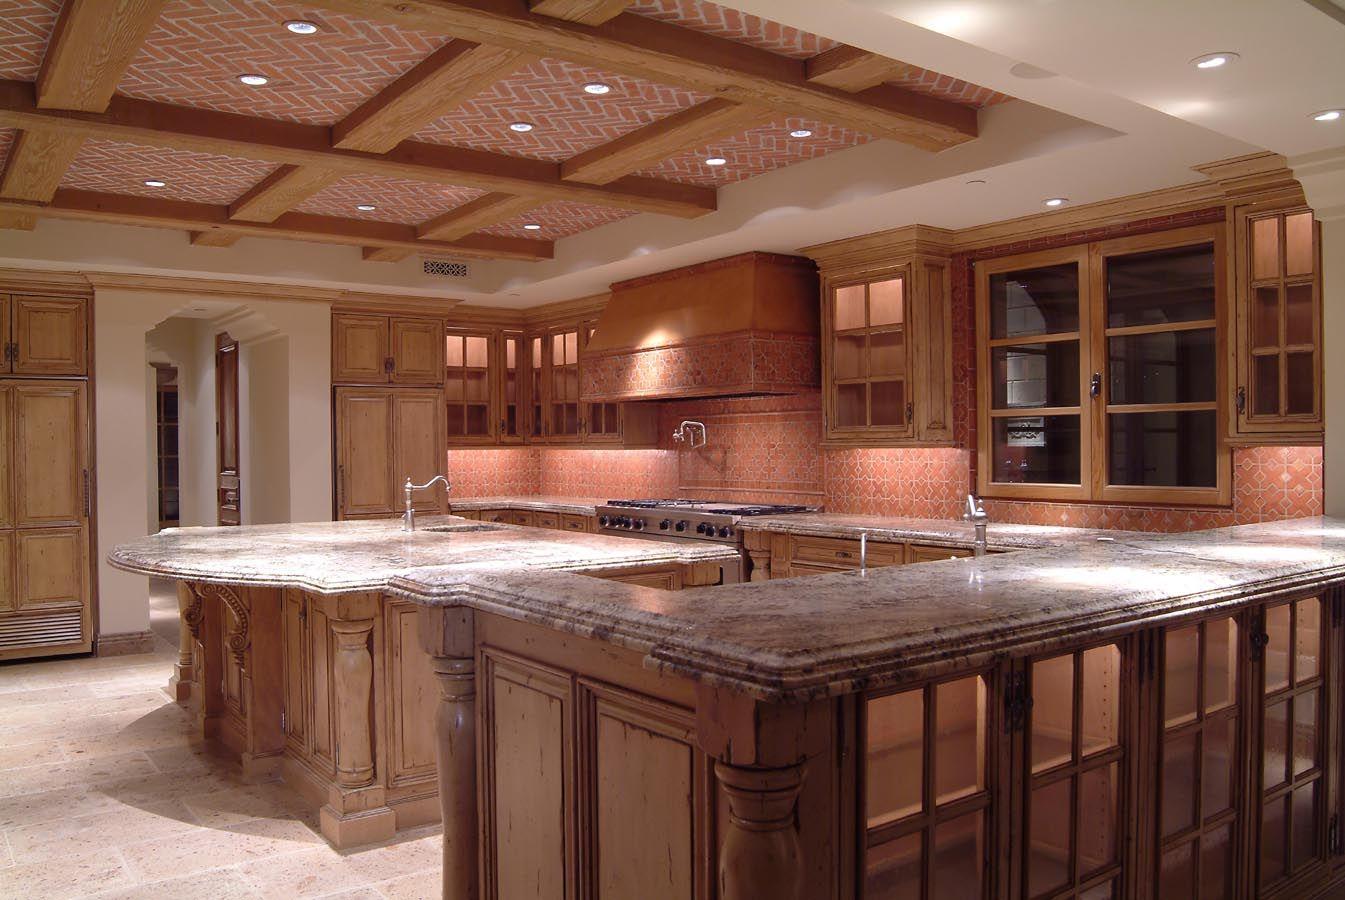 Ultra HighEnd Custom Kitchen Cabinetry  high end